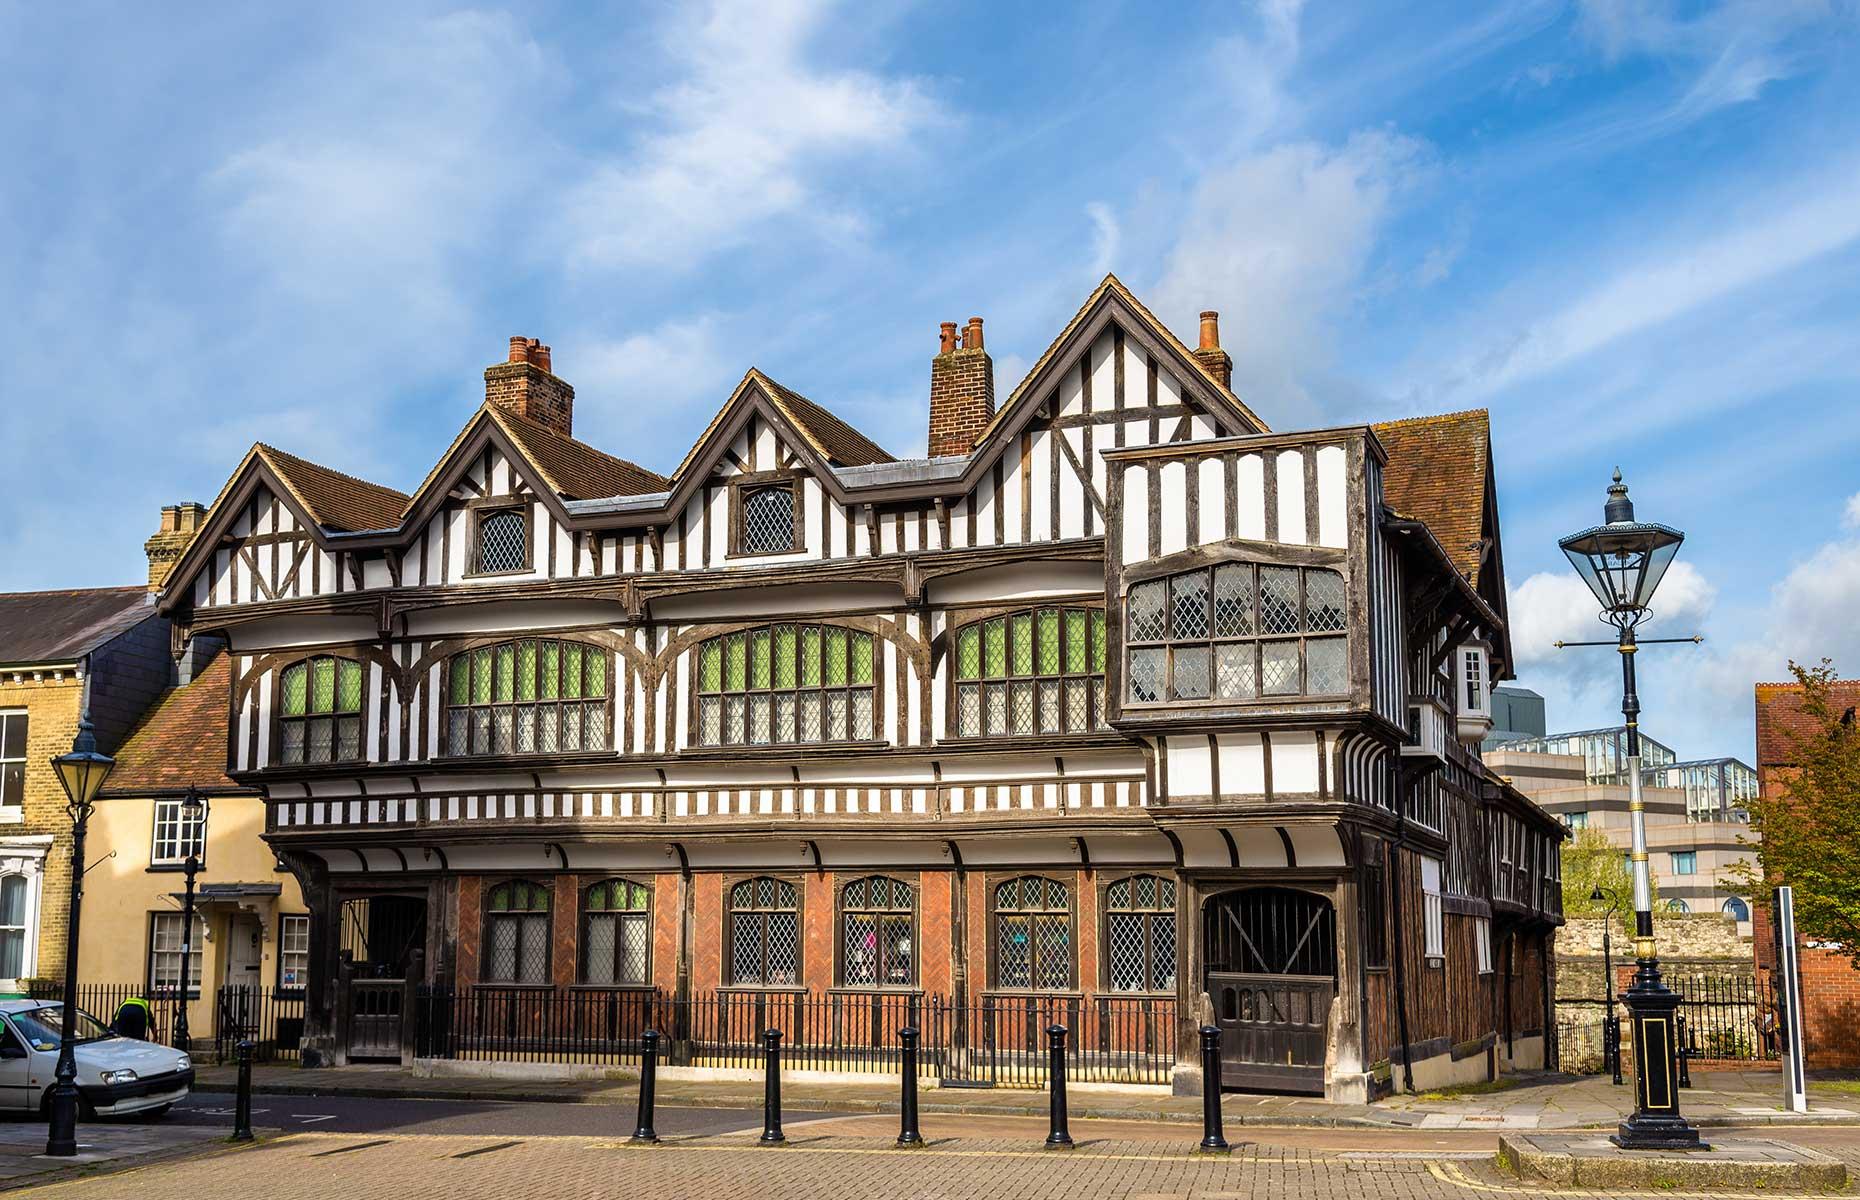 Tudor House Museum Southampton (Image: Leonid Andronov/Shutterstock)